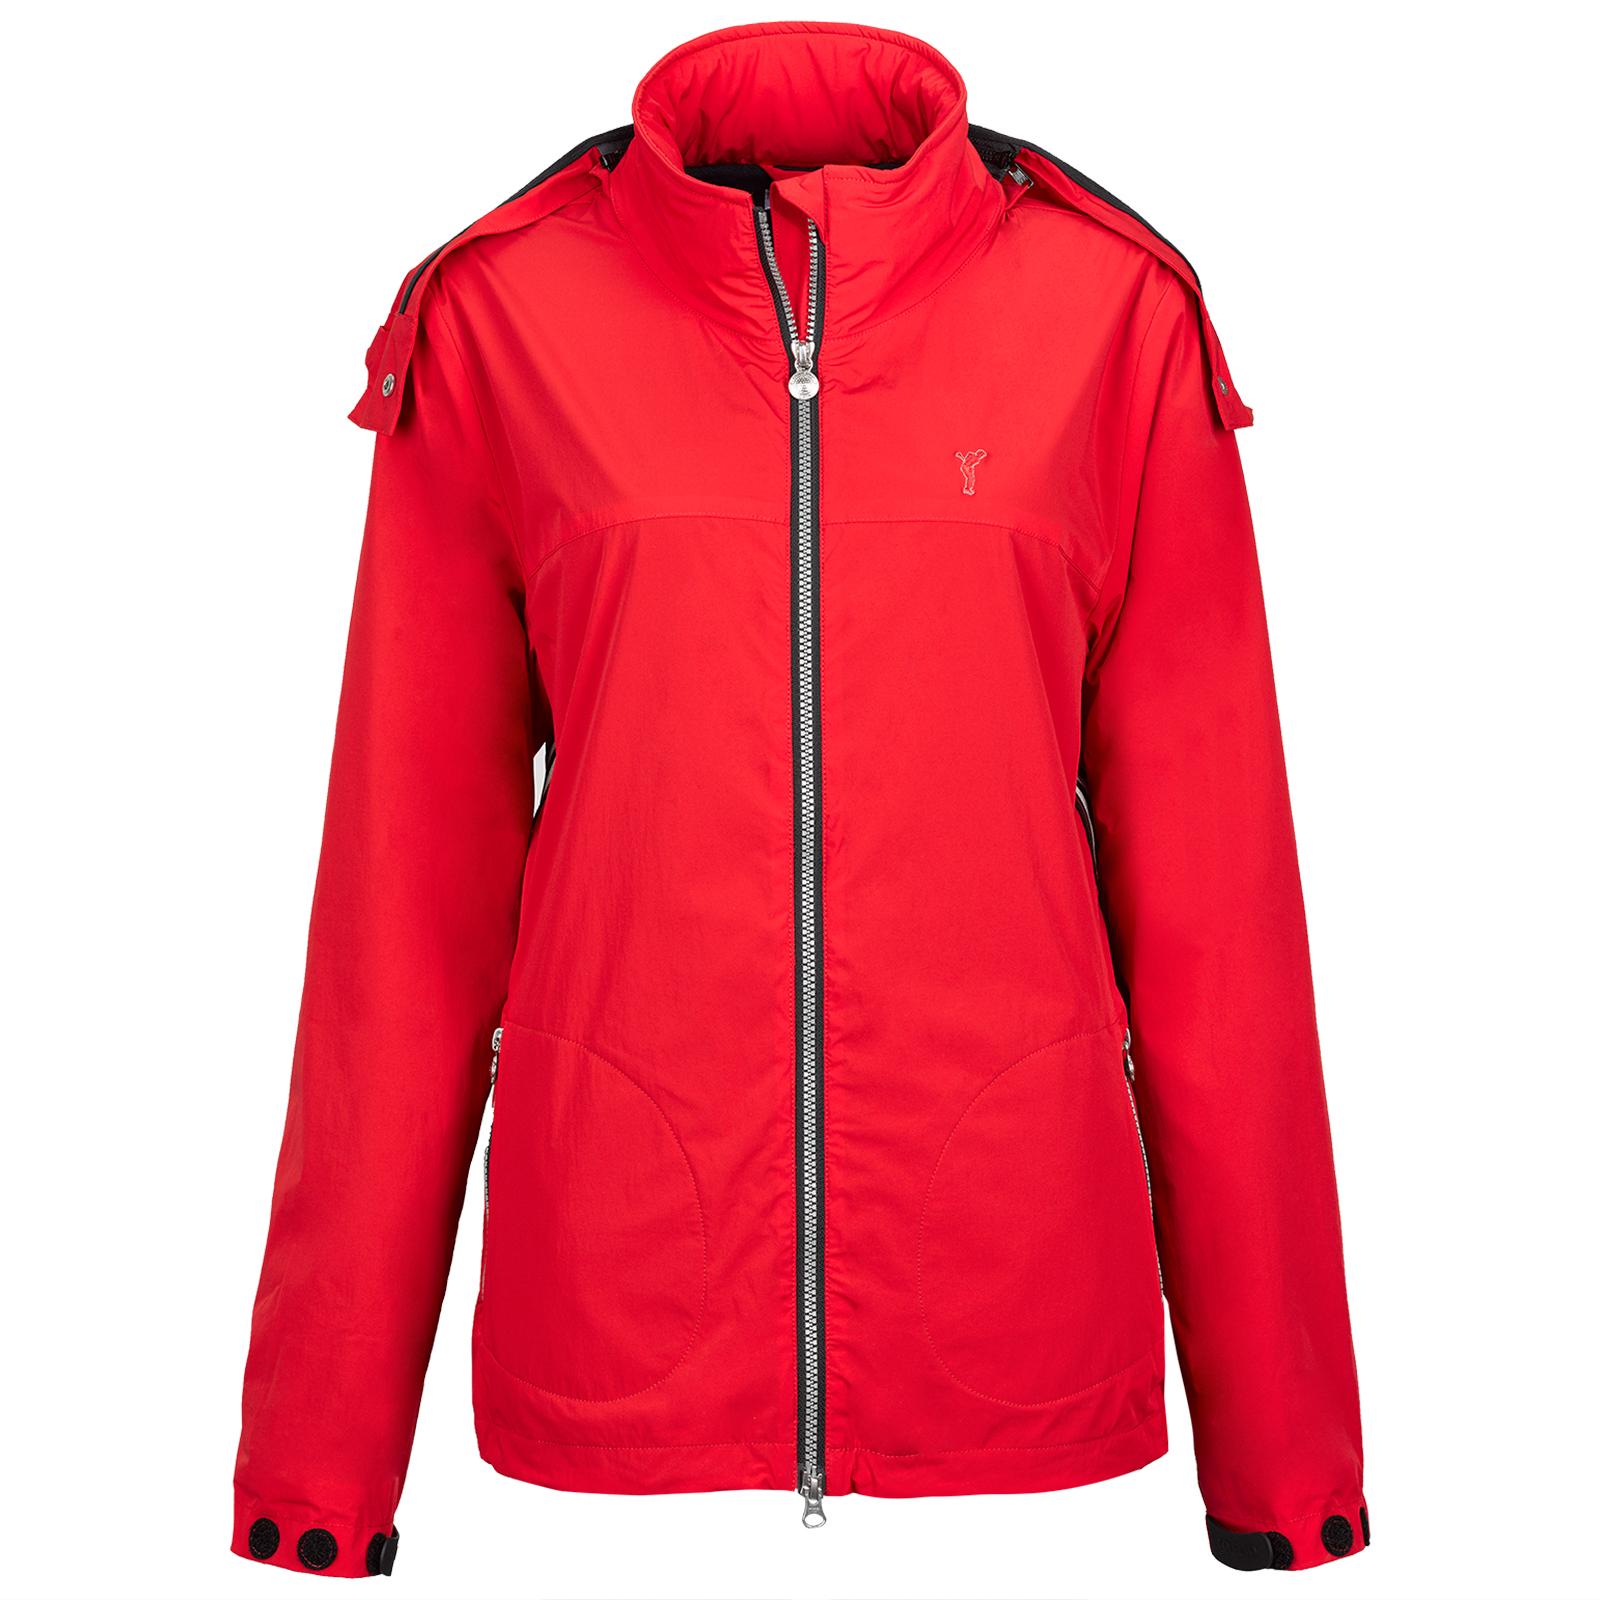 Premium Wind Protection ladies' thermo golf jacket